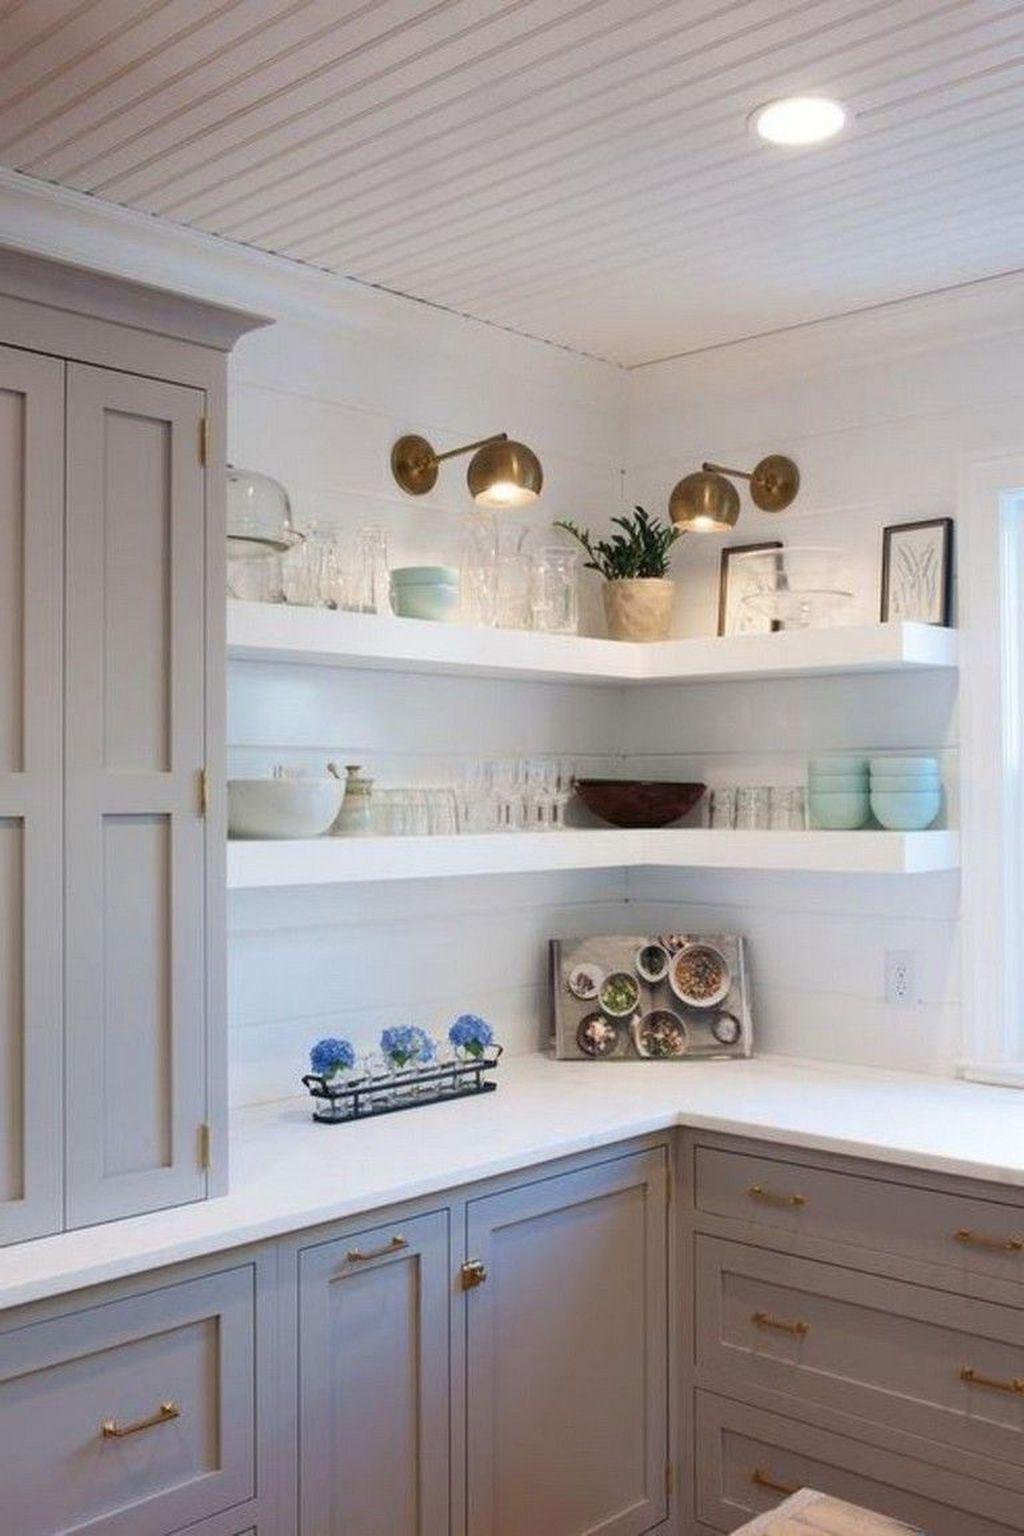 49 amazing diy floating wall corner shelves ideas diy on floating shelves kitchen id=85281